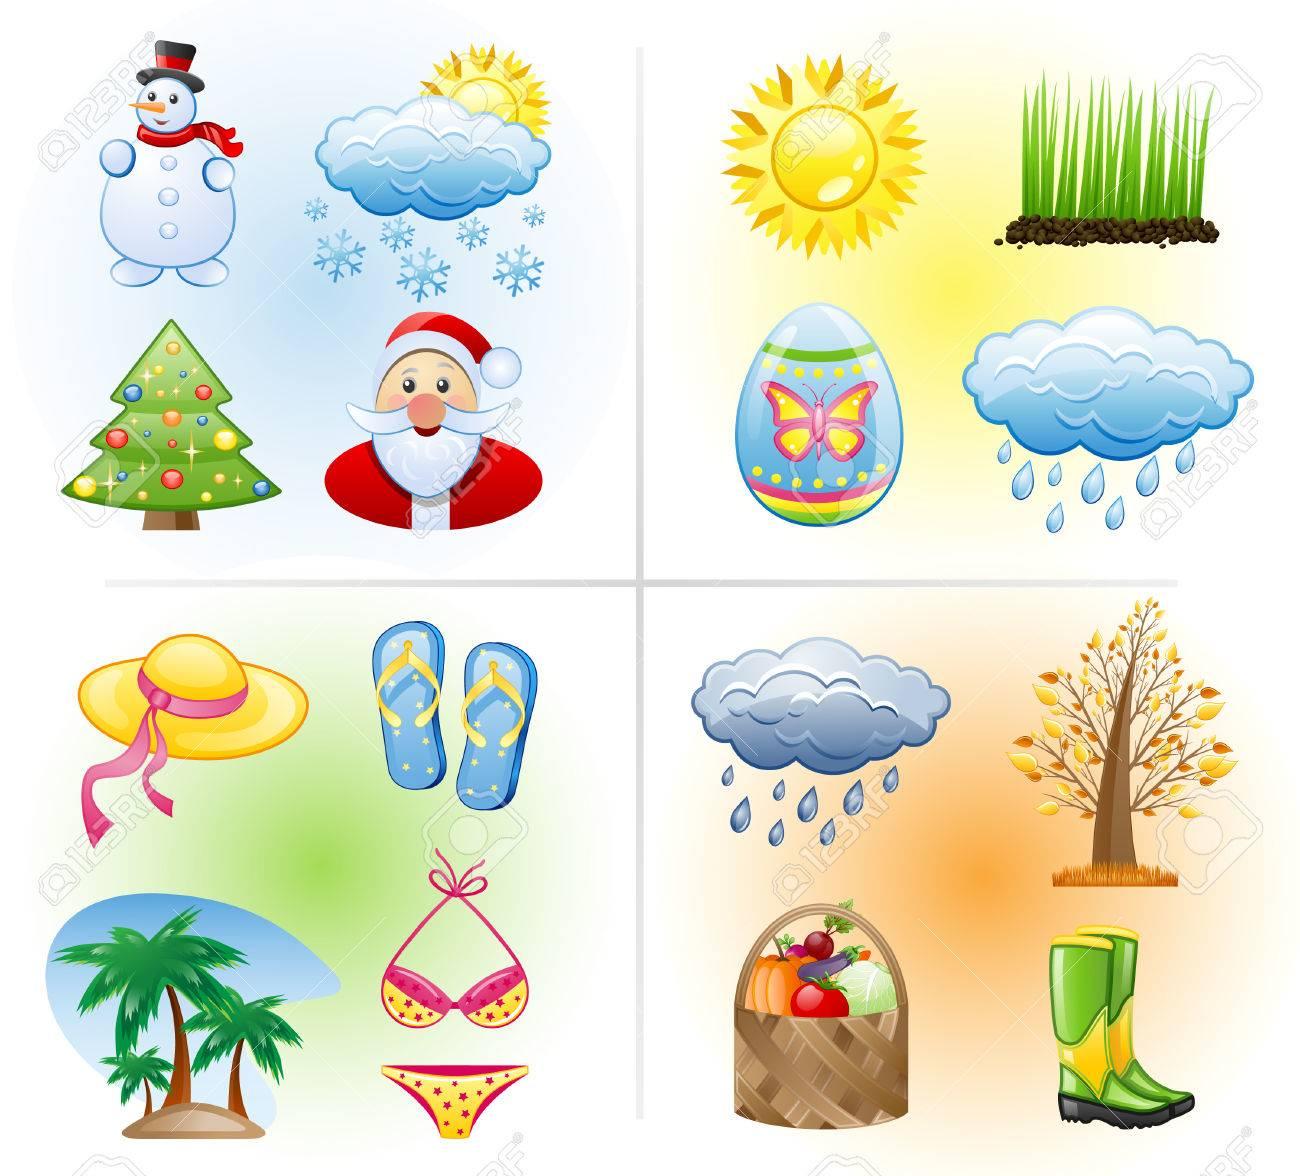 Seasons icon set: winter, spring, summer, autumn. Stock Vector - 7709153